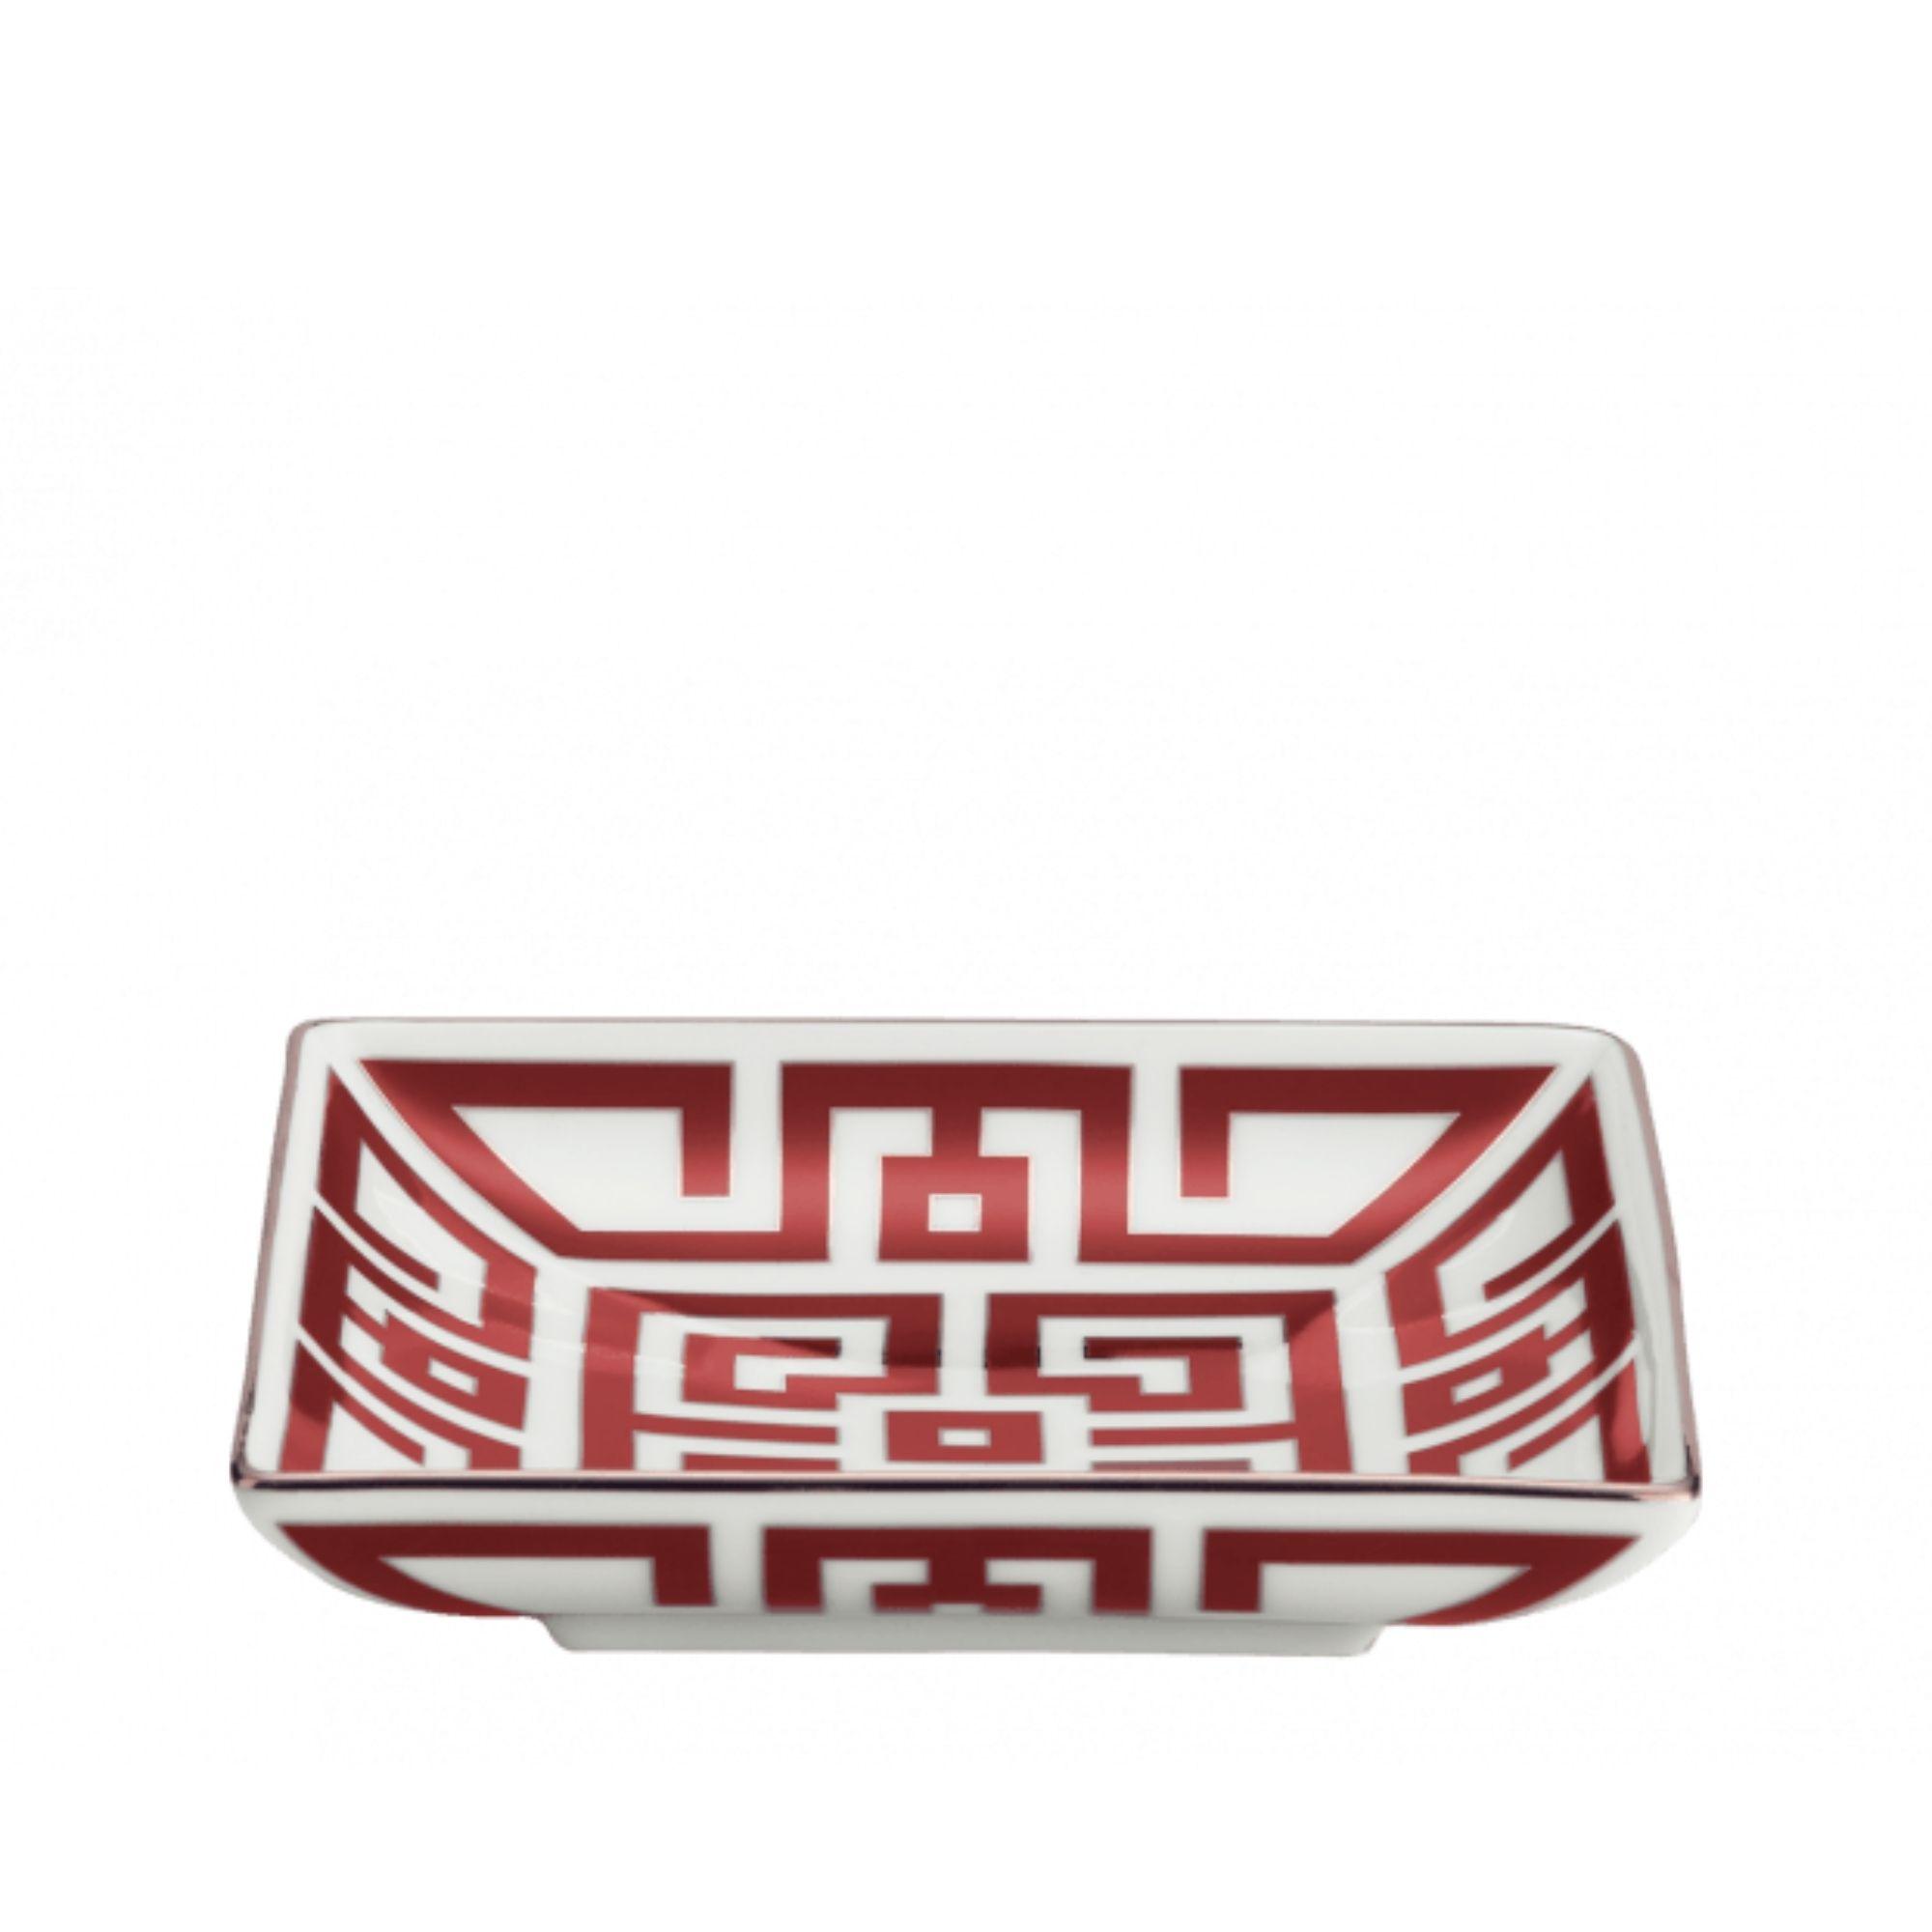 COPPA LABIRINTO SCARLATTO richard ginori tray red scarlet sconto discount 172RG01 FCP2200113XG00125300